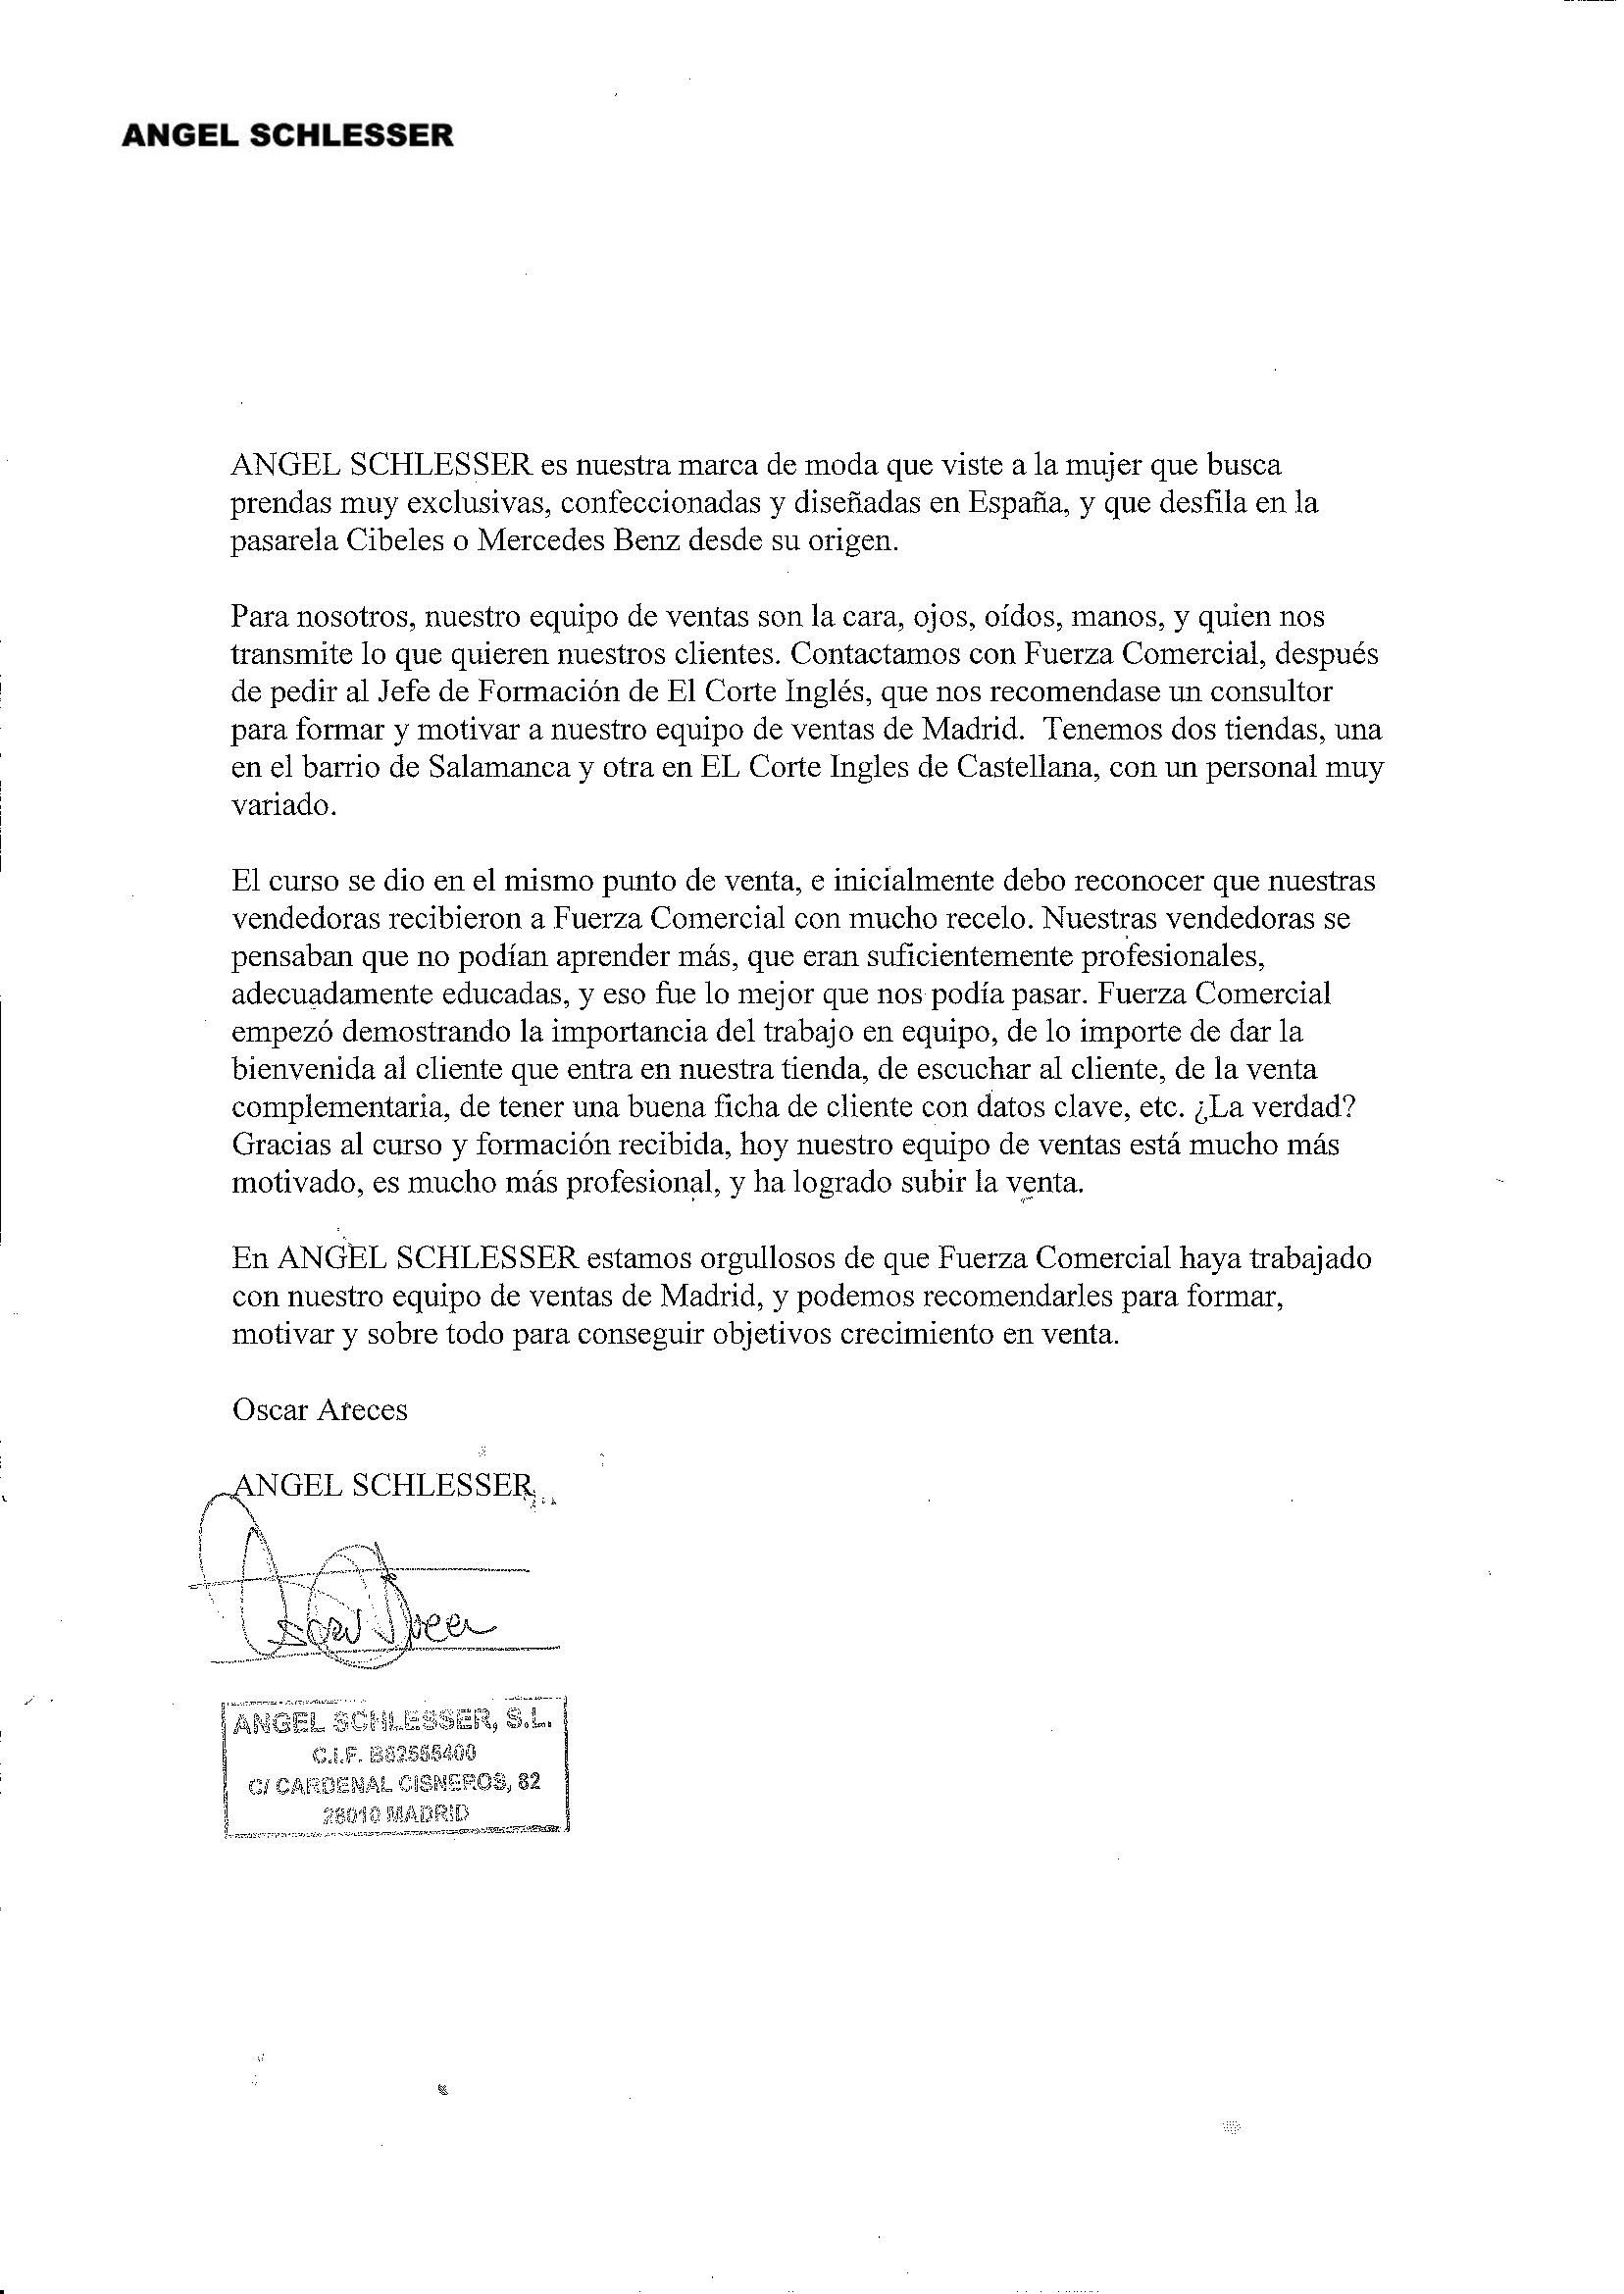 00 Carta Recomendacion Angel Schlesser OJT Retail